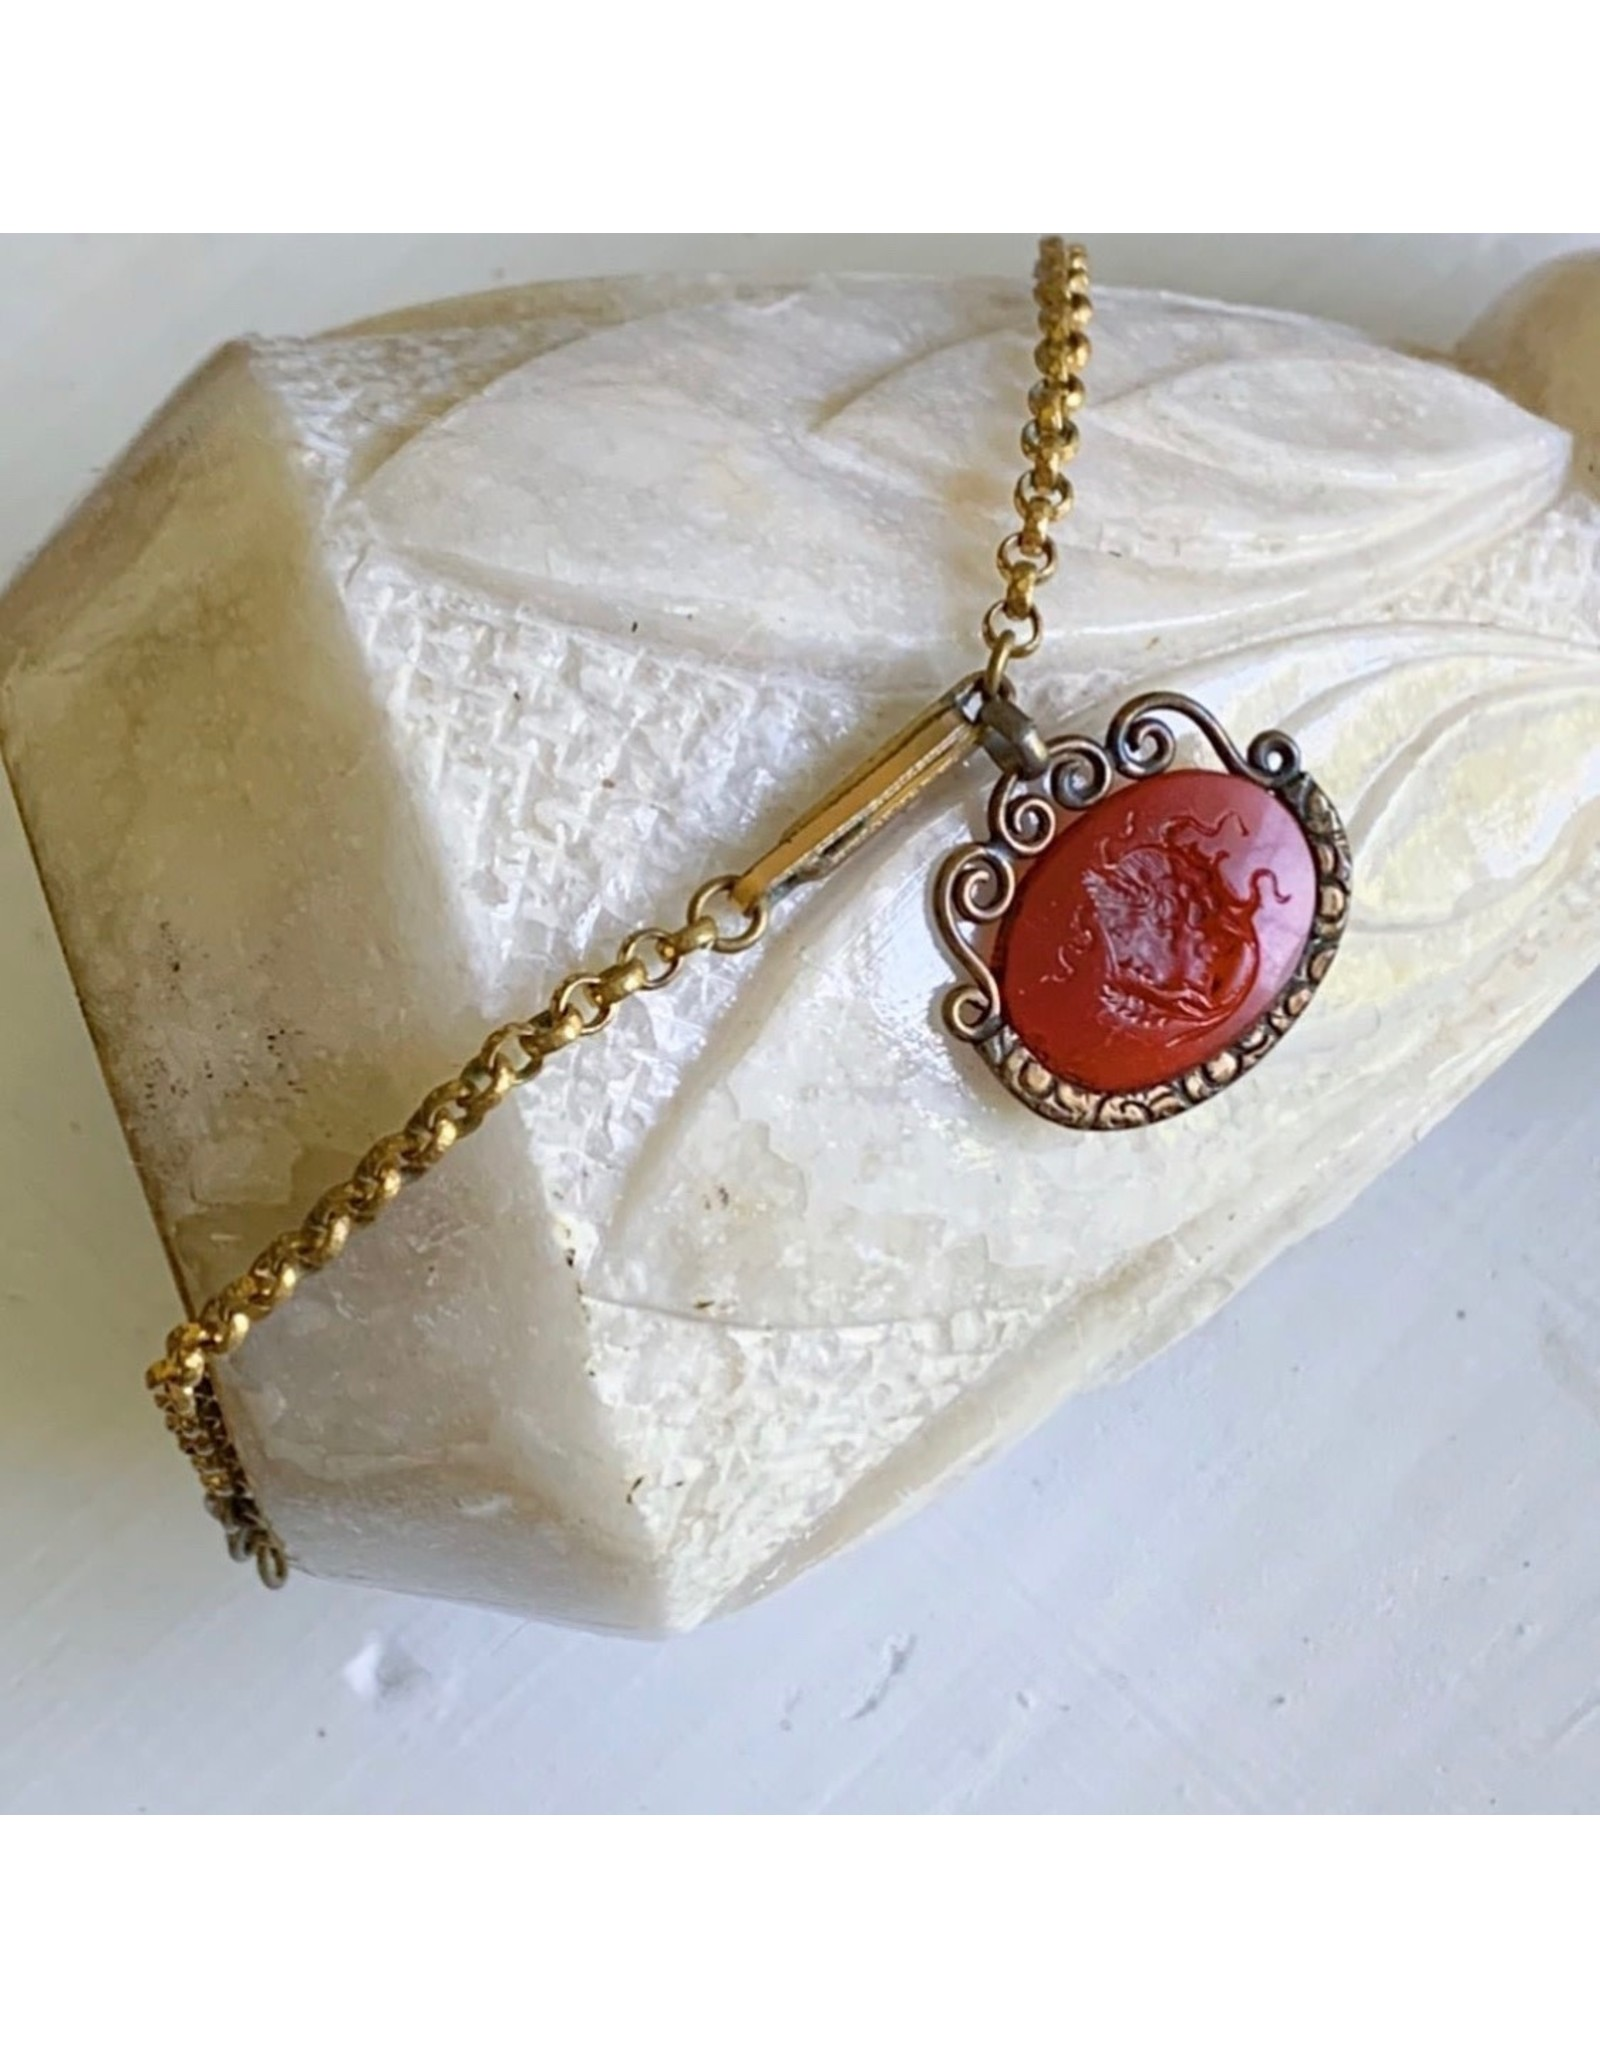 Intaglio Medusa Fob Bracelet